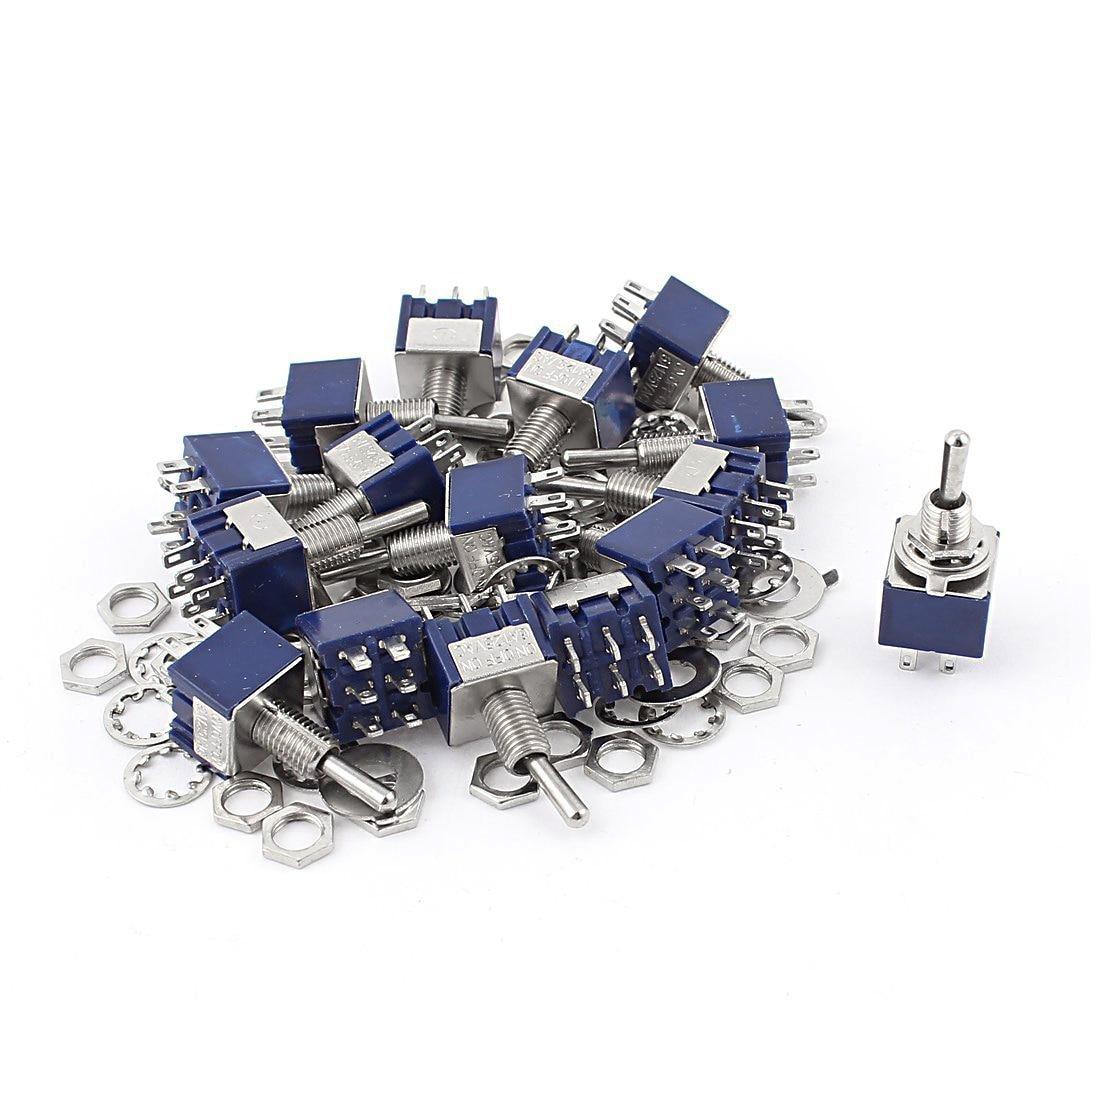 KSOL 20Pcs AC 125V 6A ON-OFF-ON DPDT Locking Mini Toggle Switch Blue 6mm